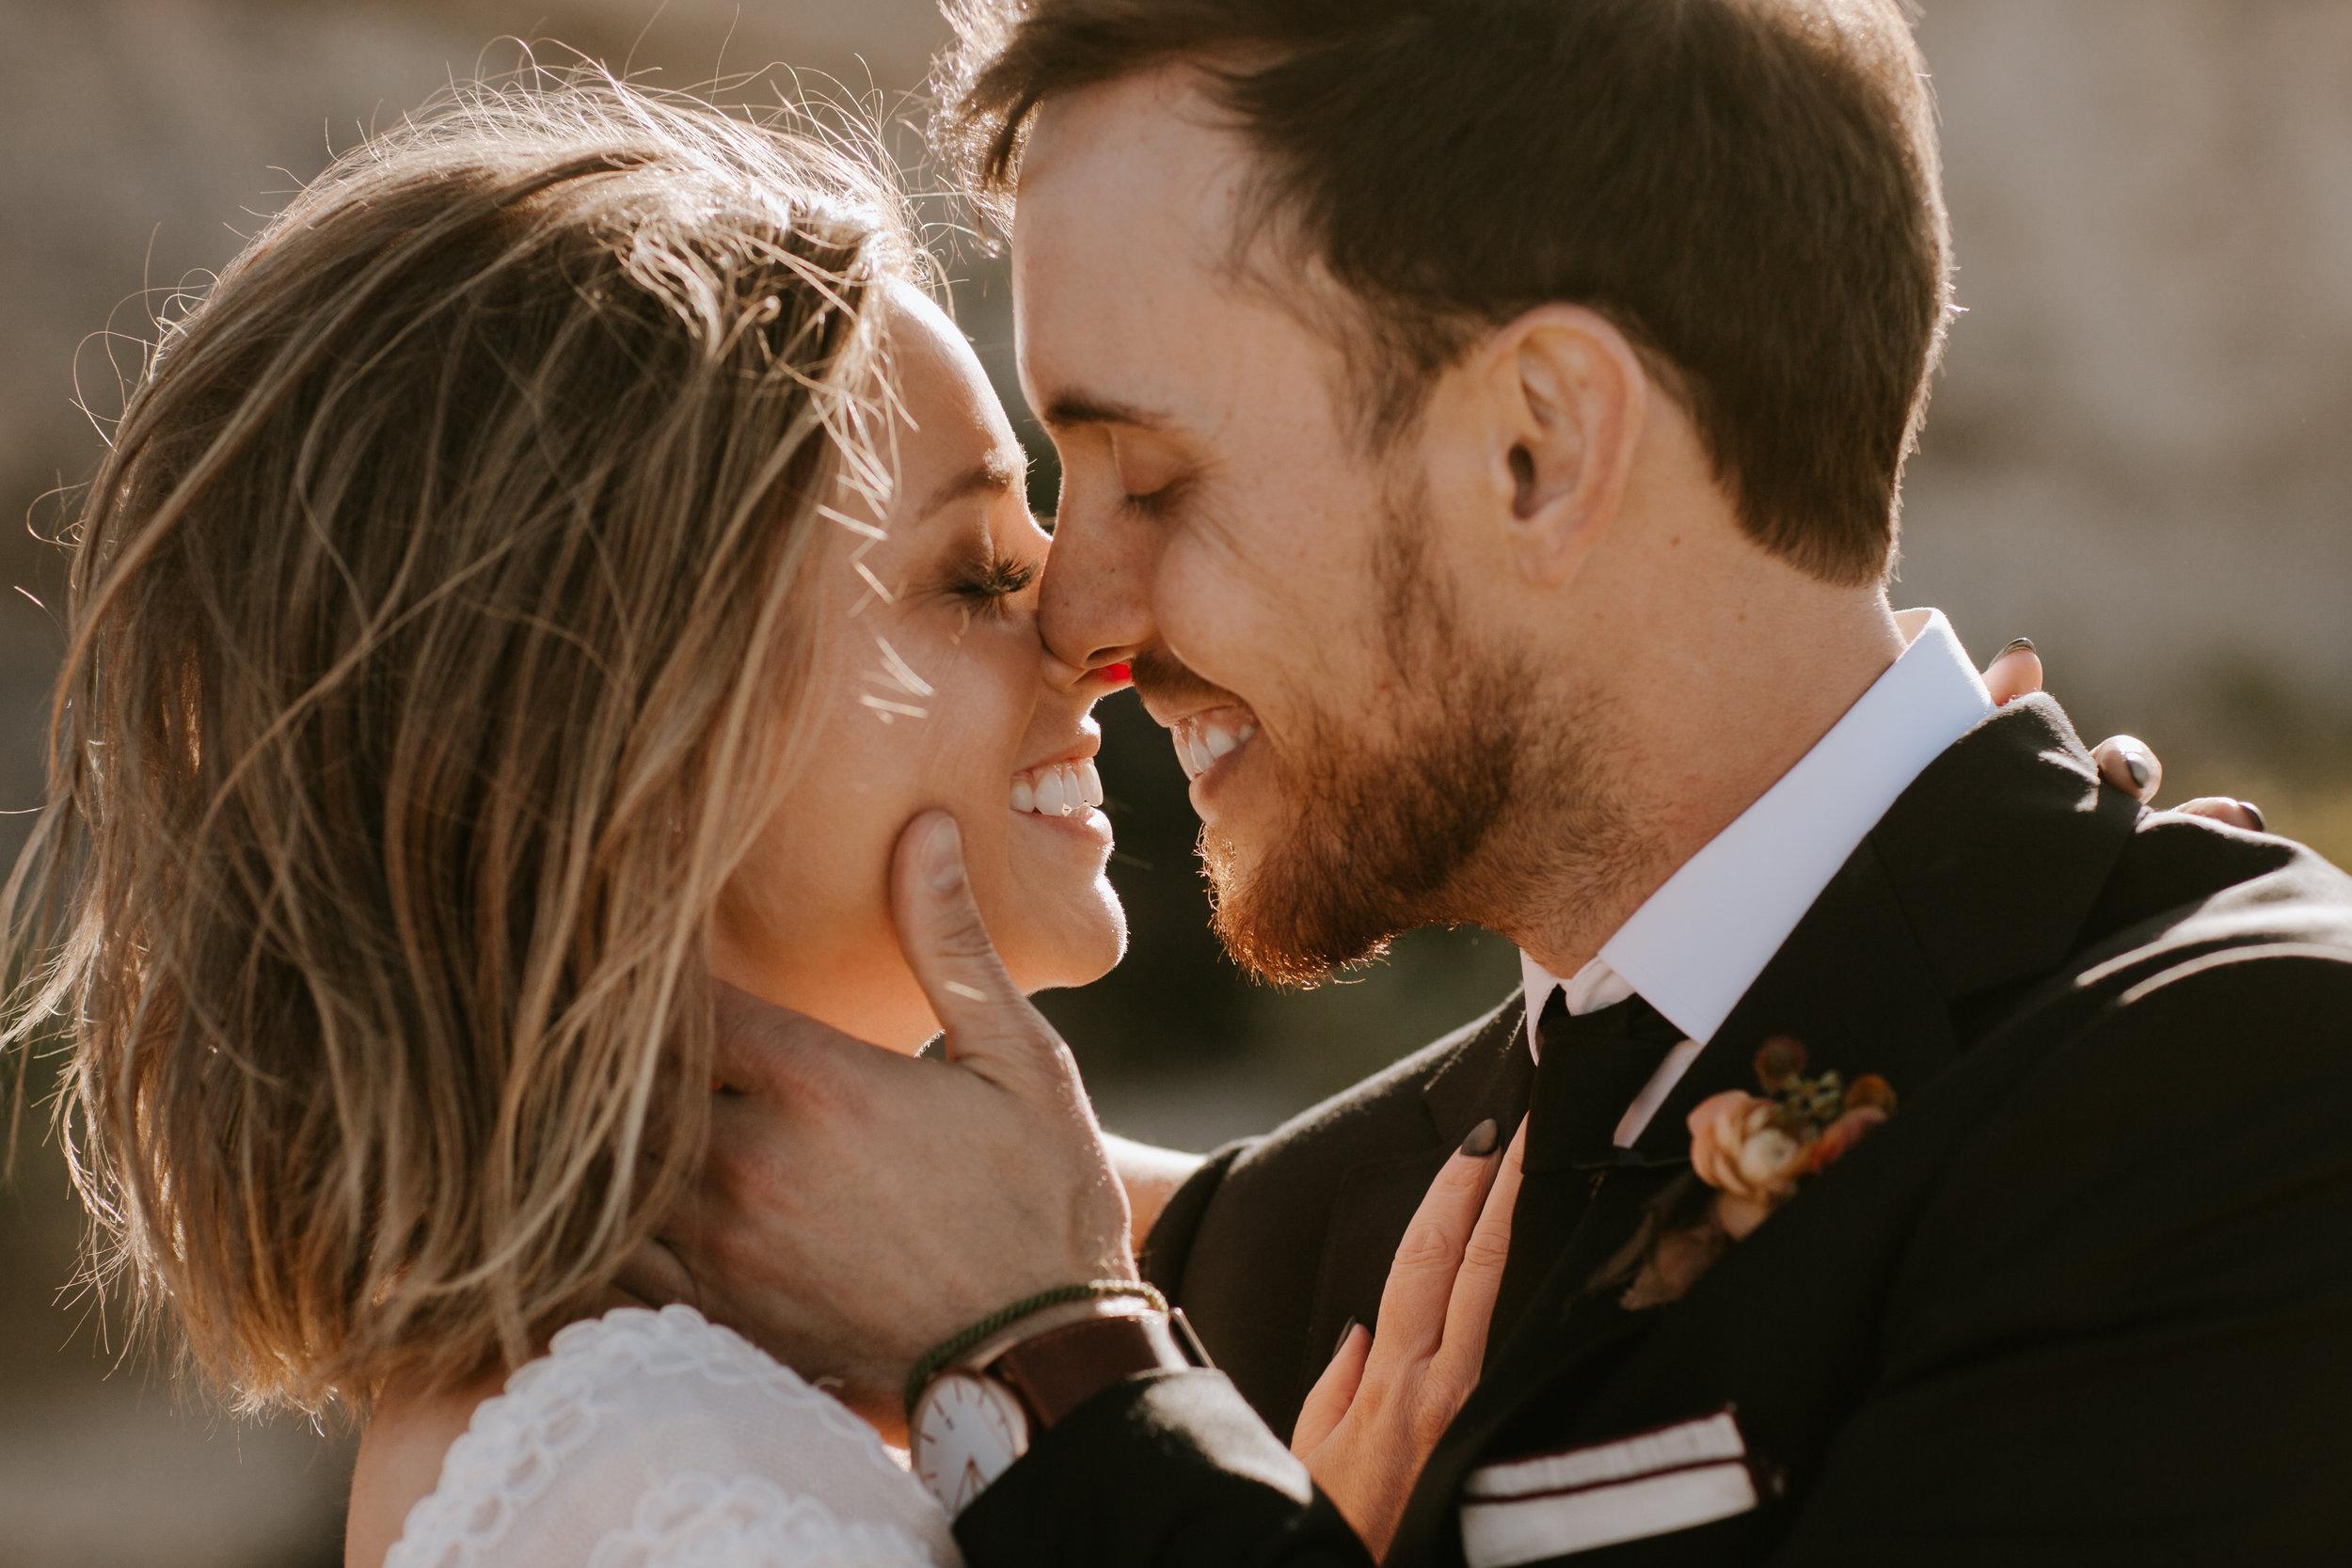 2019-05-26_Callie-Evan_Wedding_Joshua Tree_Paige Nelson_PREVIEWS HR-45.jpg